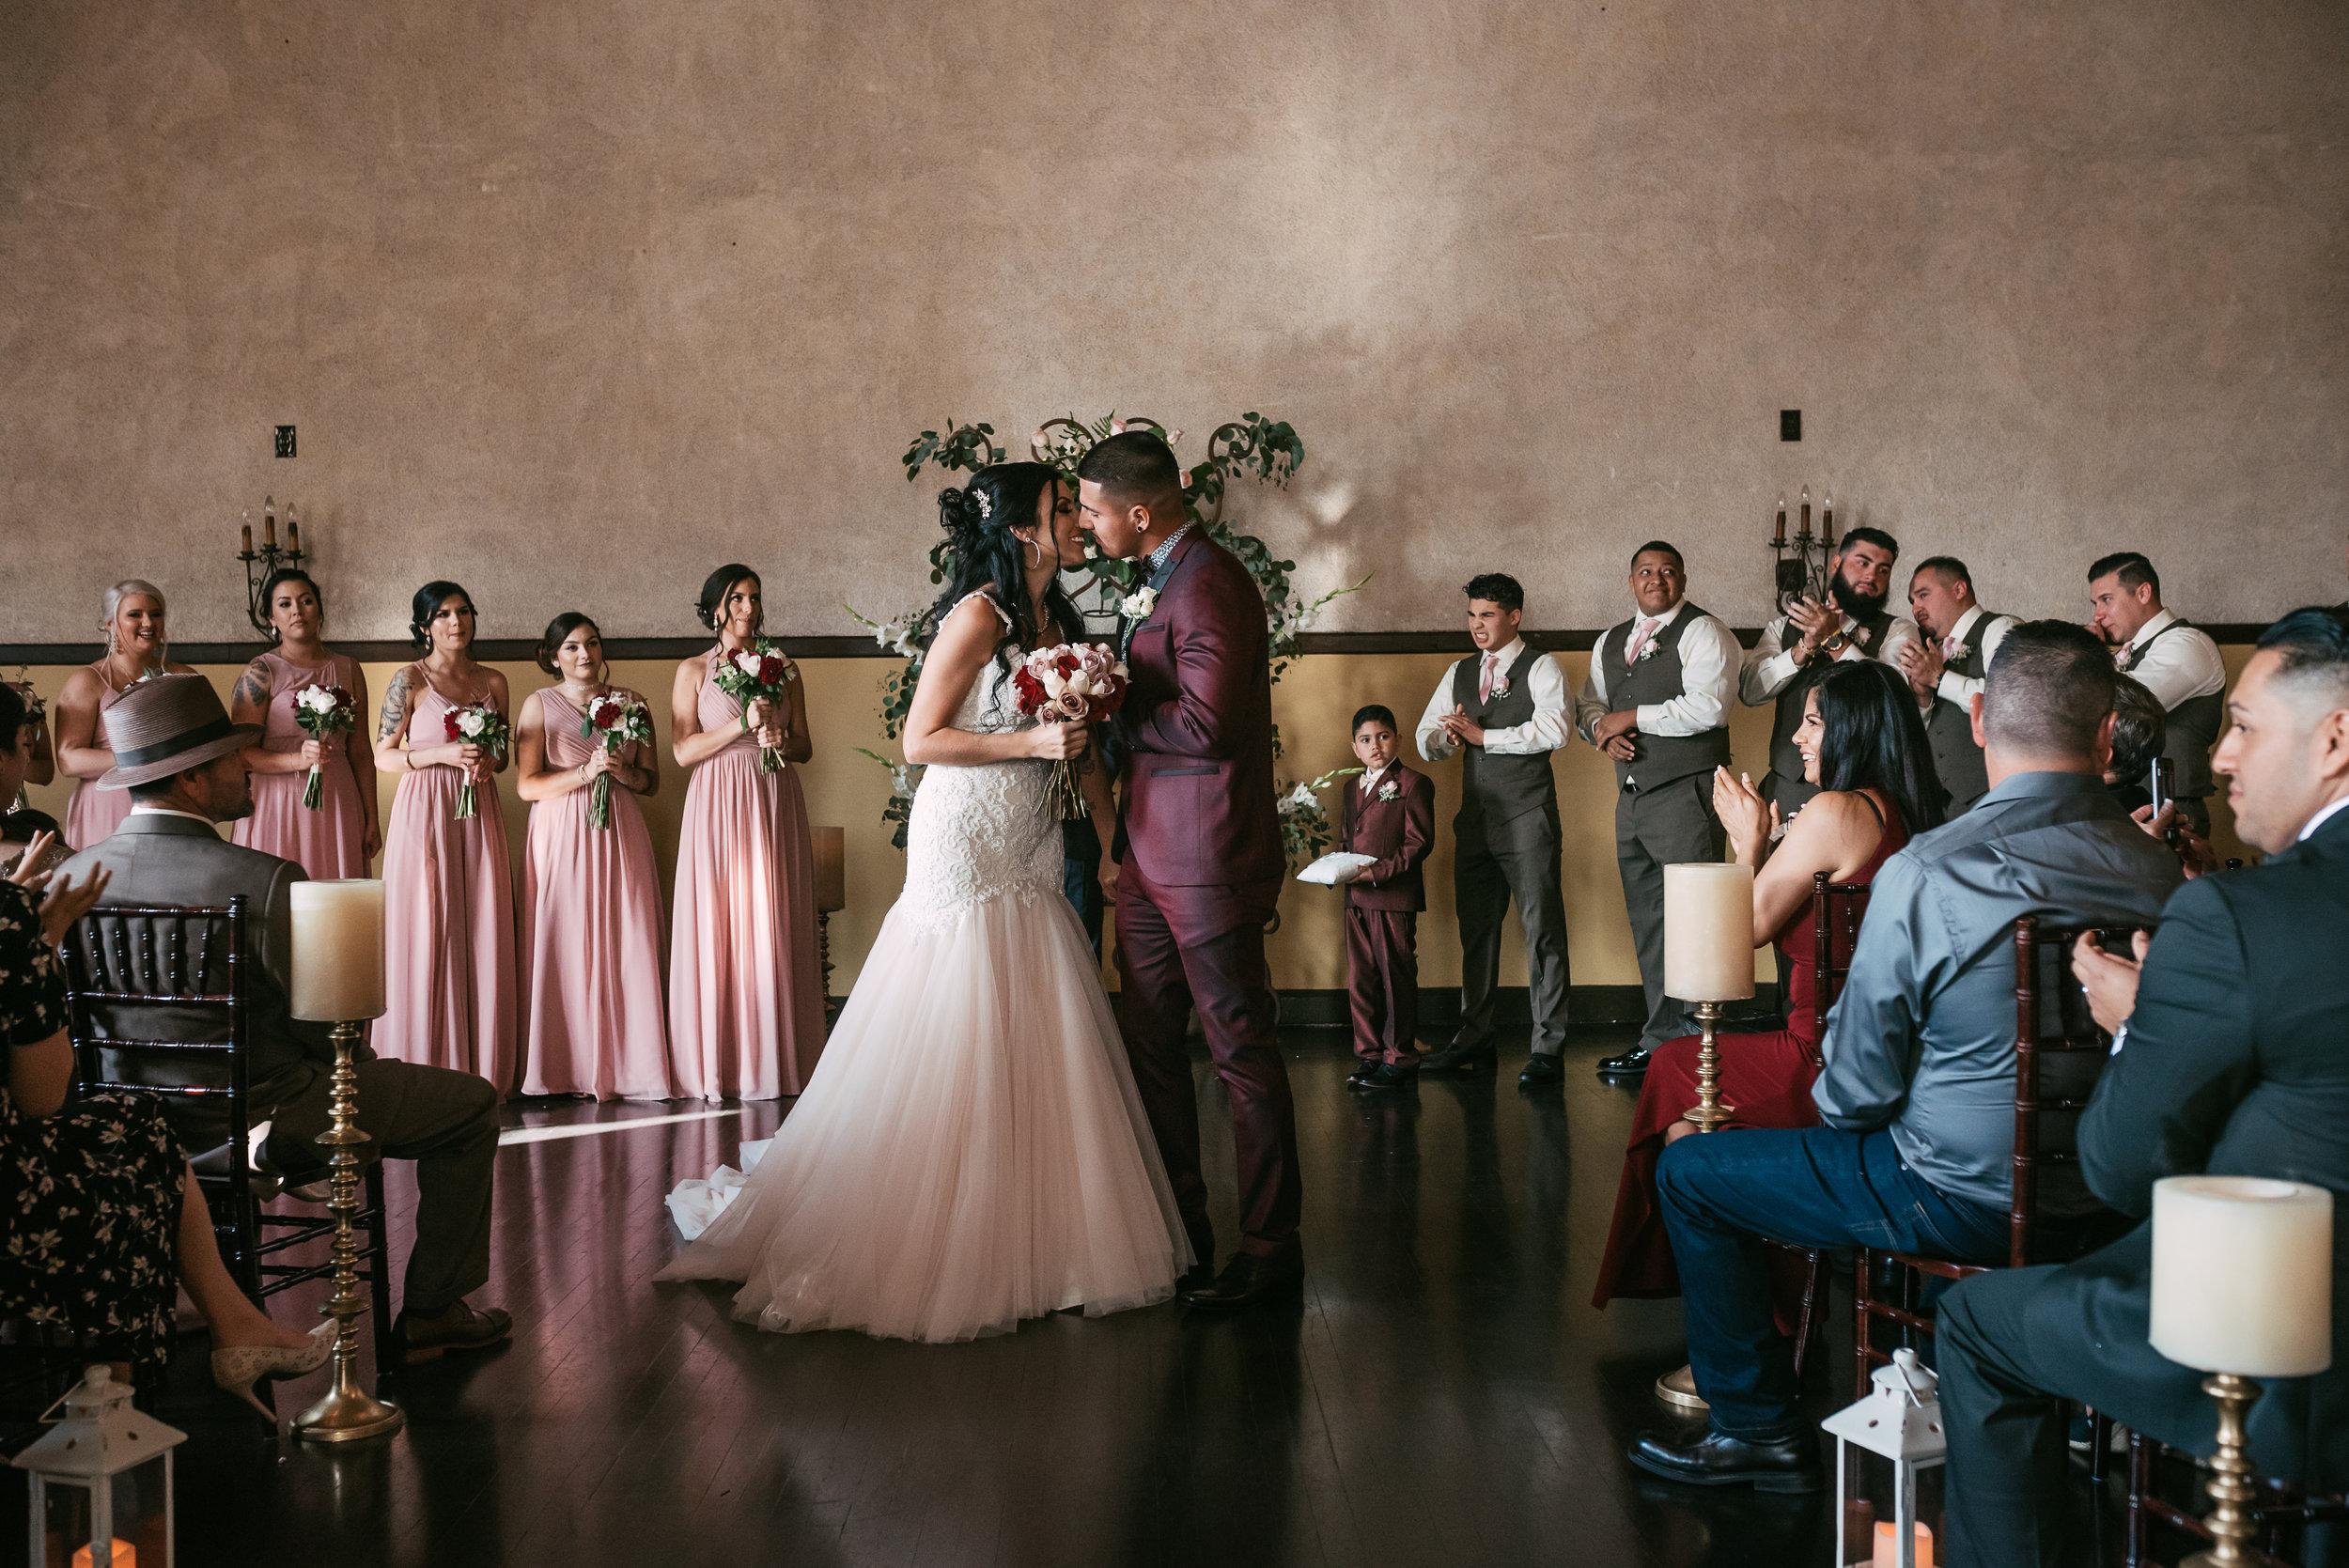 loft-84-riverside-maura-wedding-ceremony-85.jpg